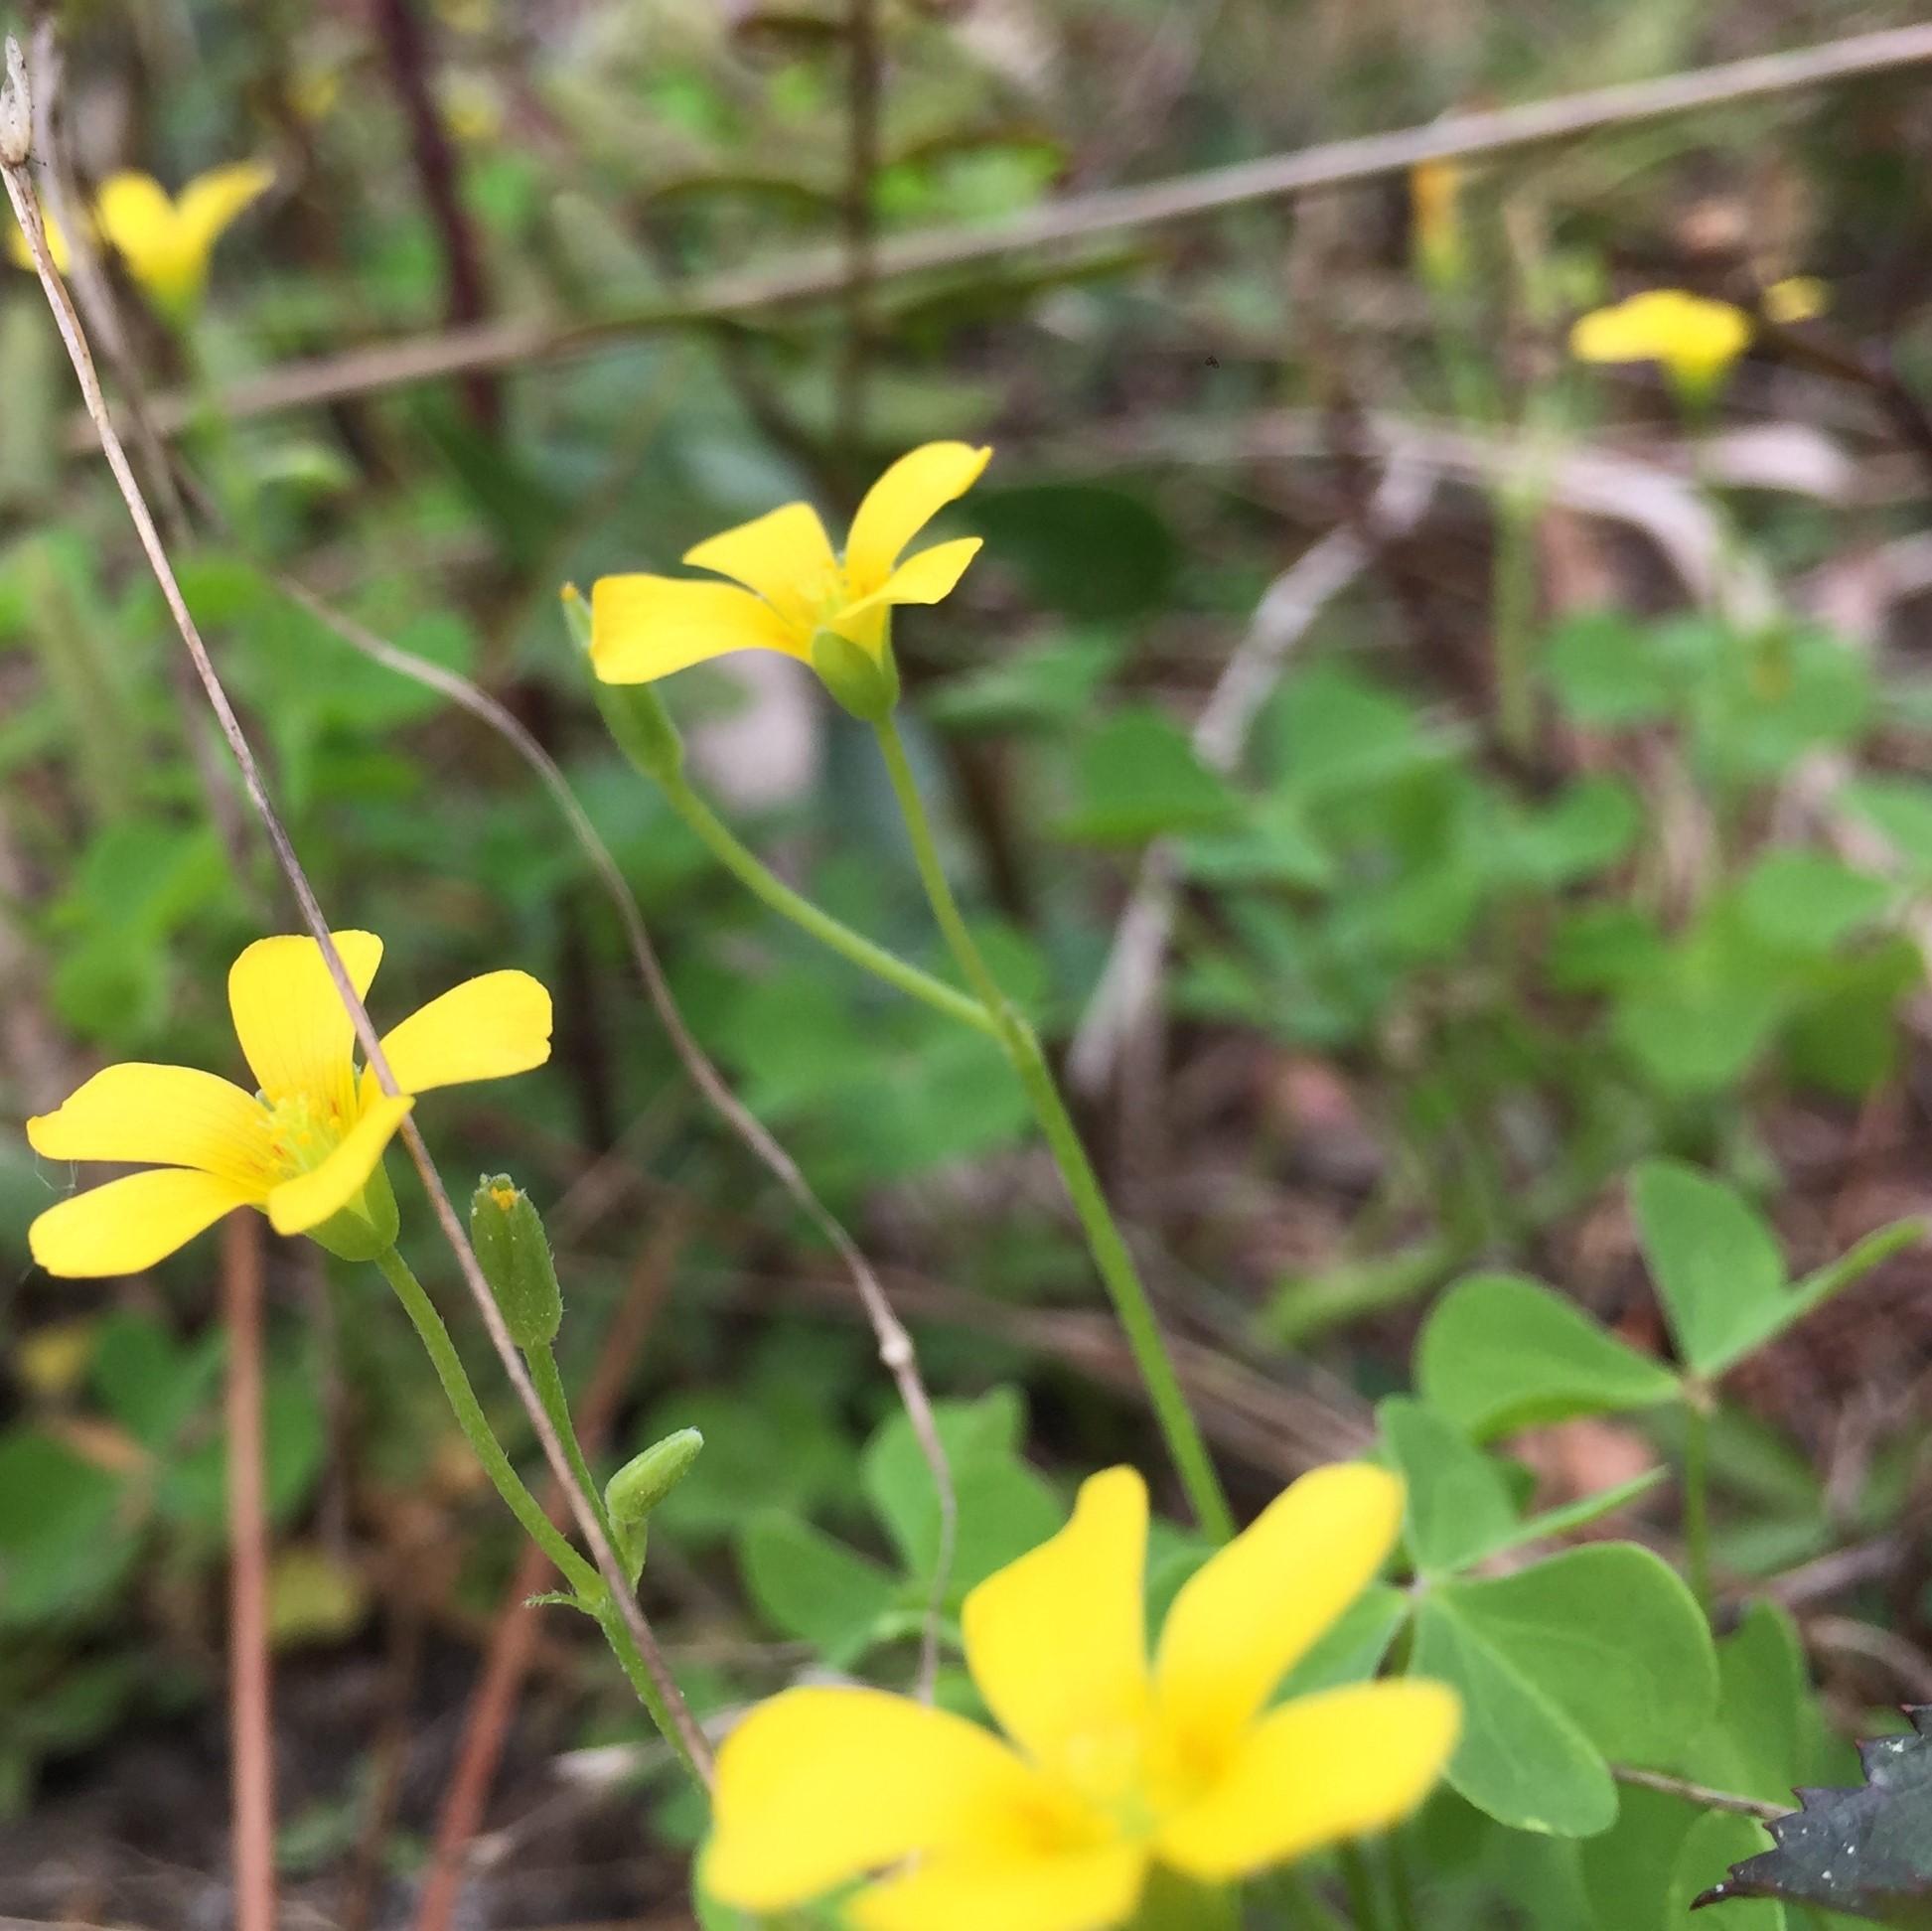 NaturalBridge031818.jpg